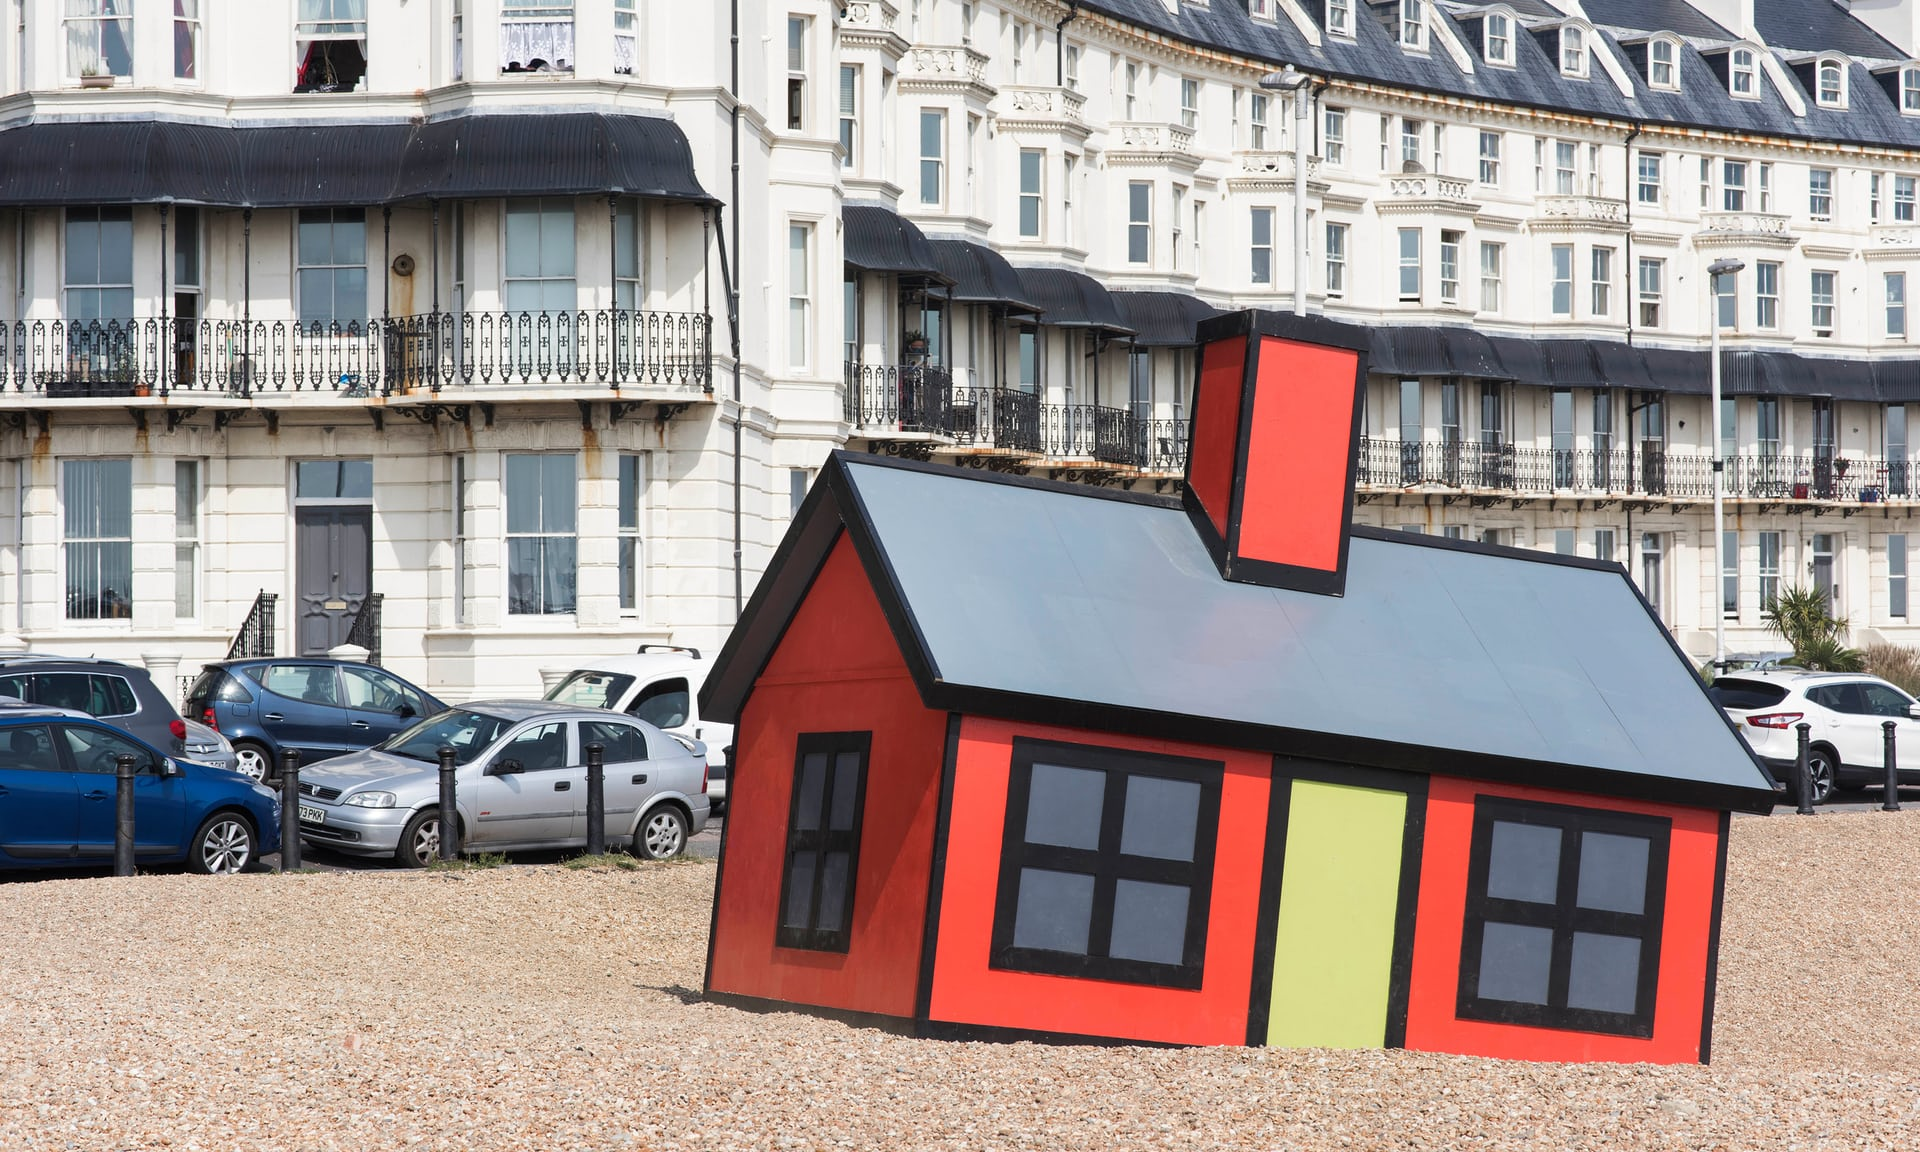 Review: Folkestone triennial